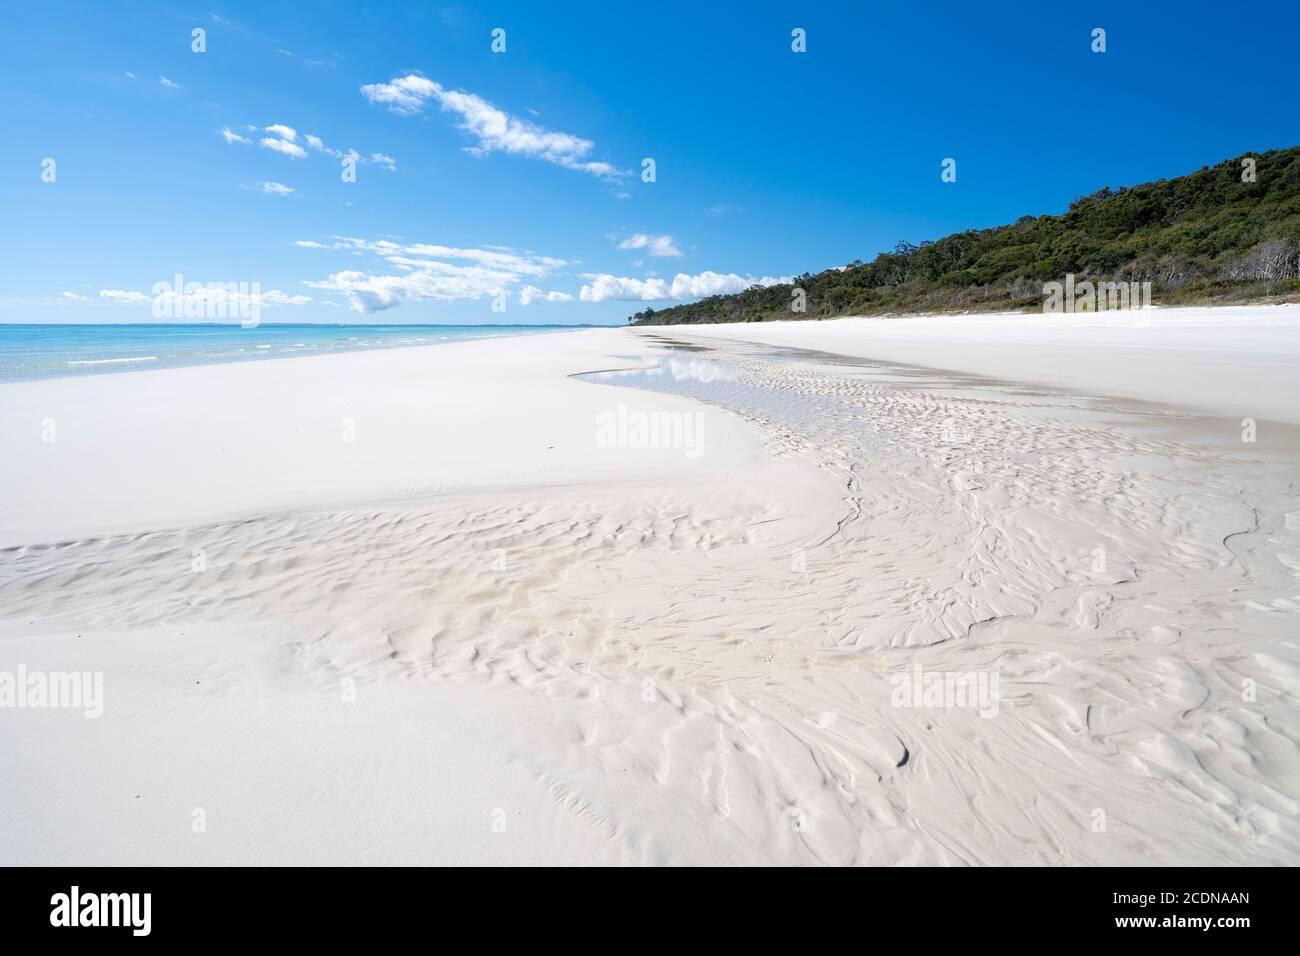 White sandy beach and clear water under blue sky, near Awinya Creek, western shore of Fraser Island, Hervey Bay Queensland Australia Stock Photo